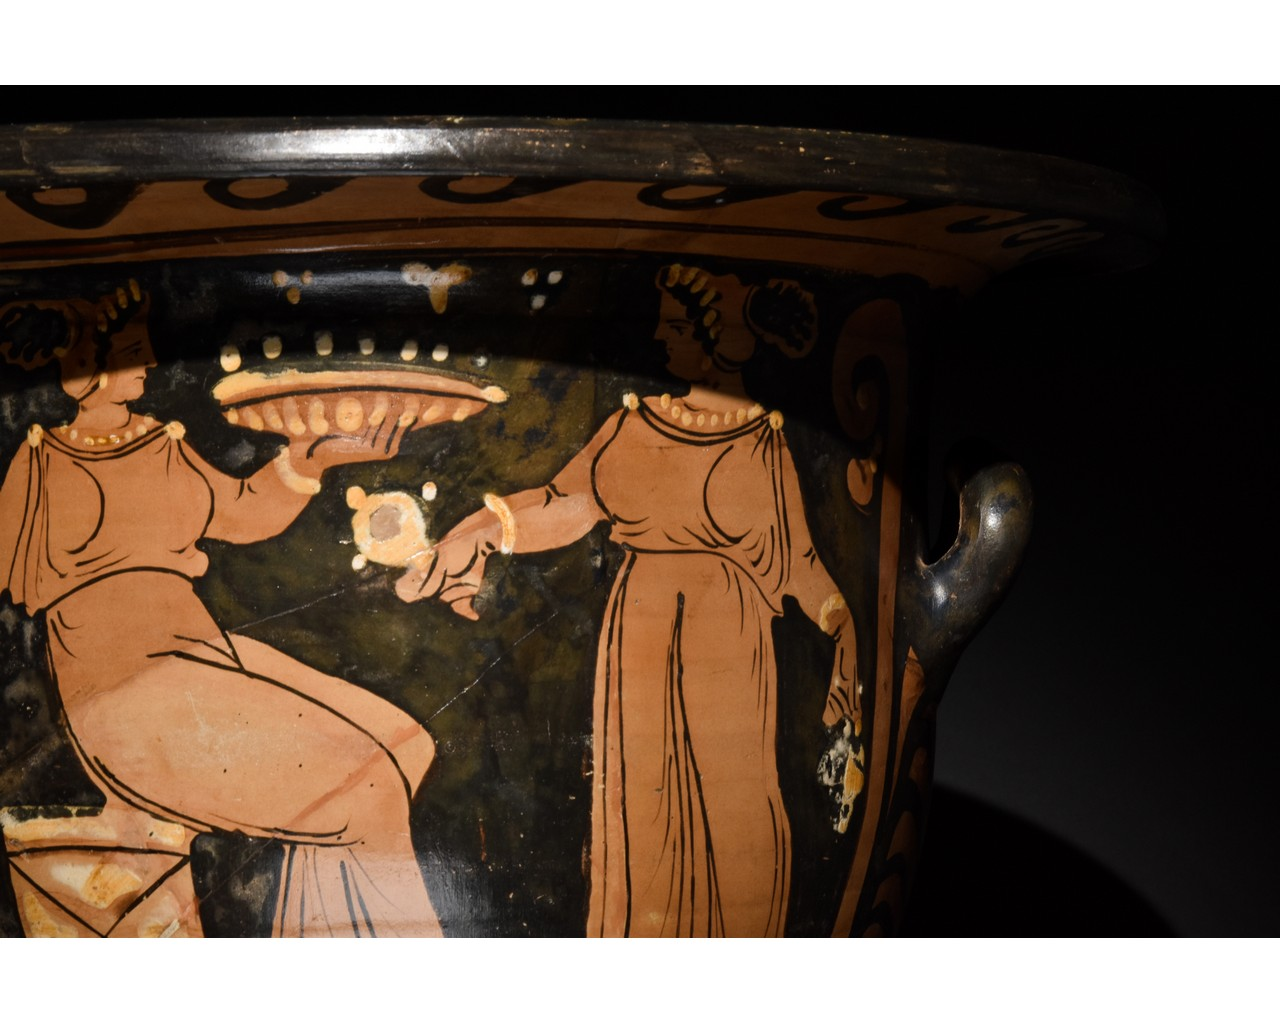 LARGE GREEK APULIAN BELL KRATER - TL TESTED - Image 8 of 15